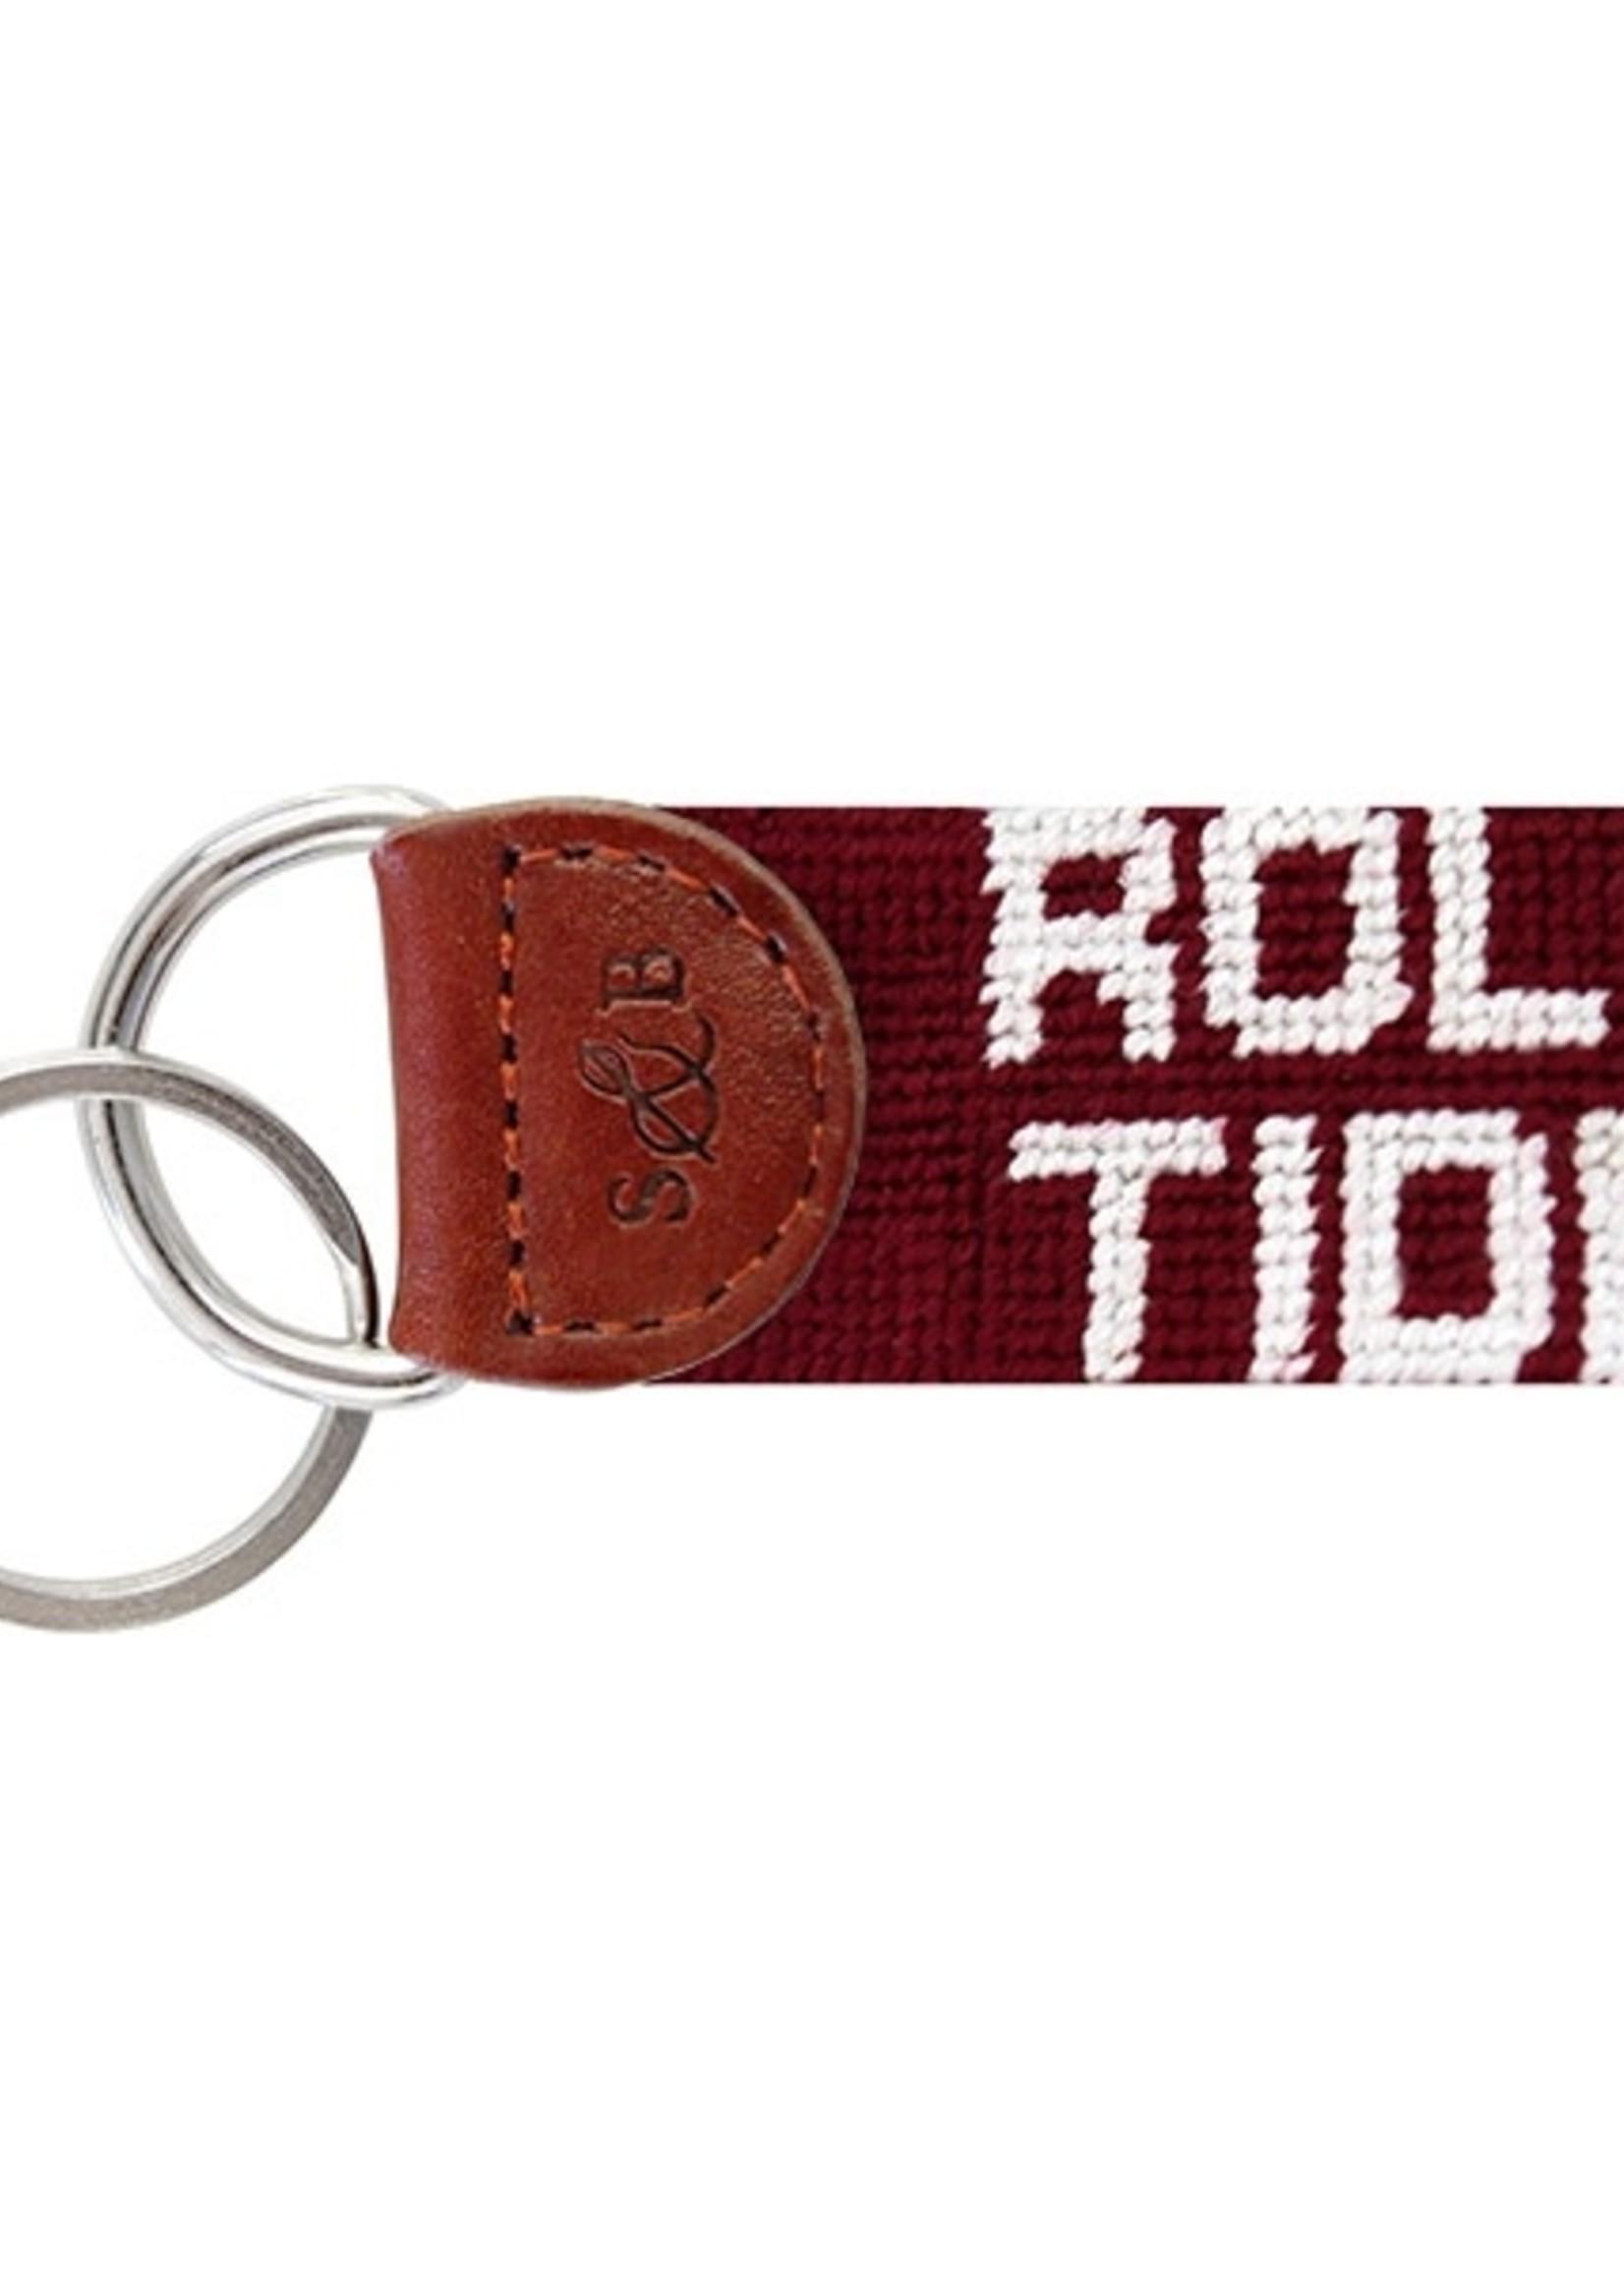 Smathers & Branson Roll Tide Key Fob